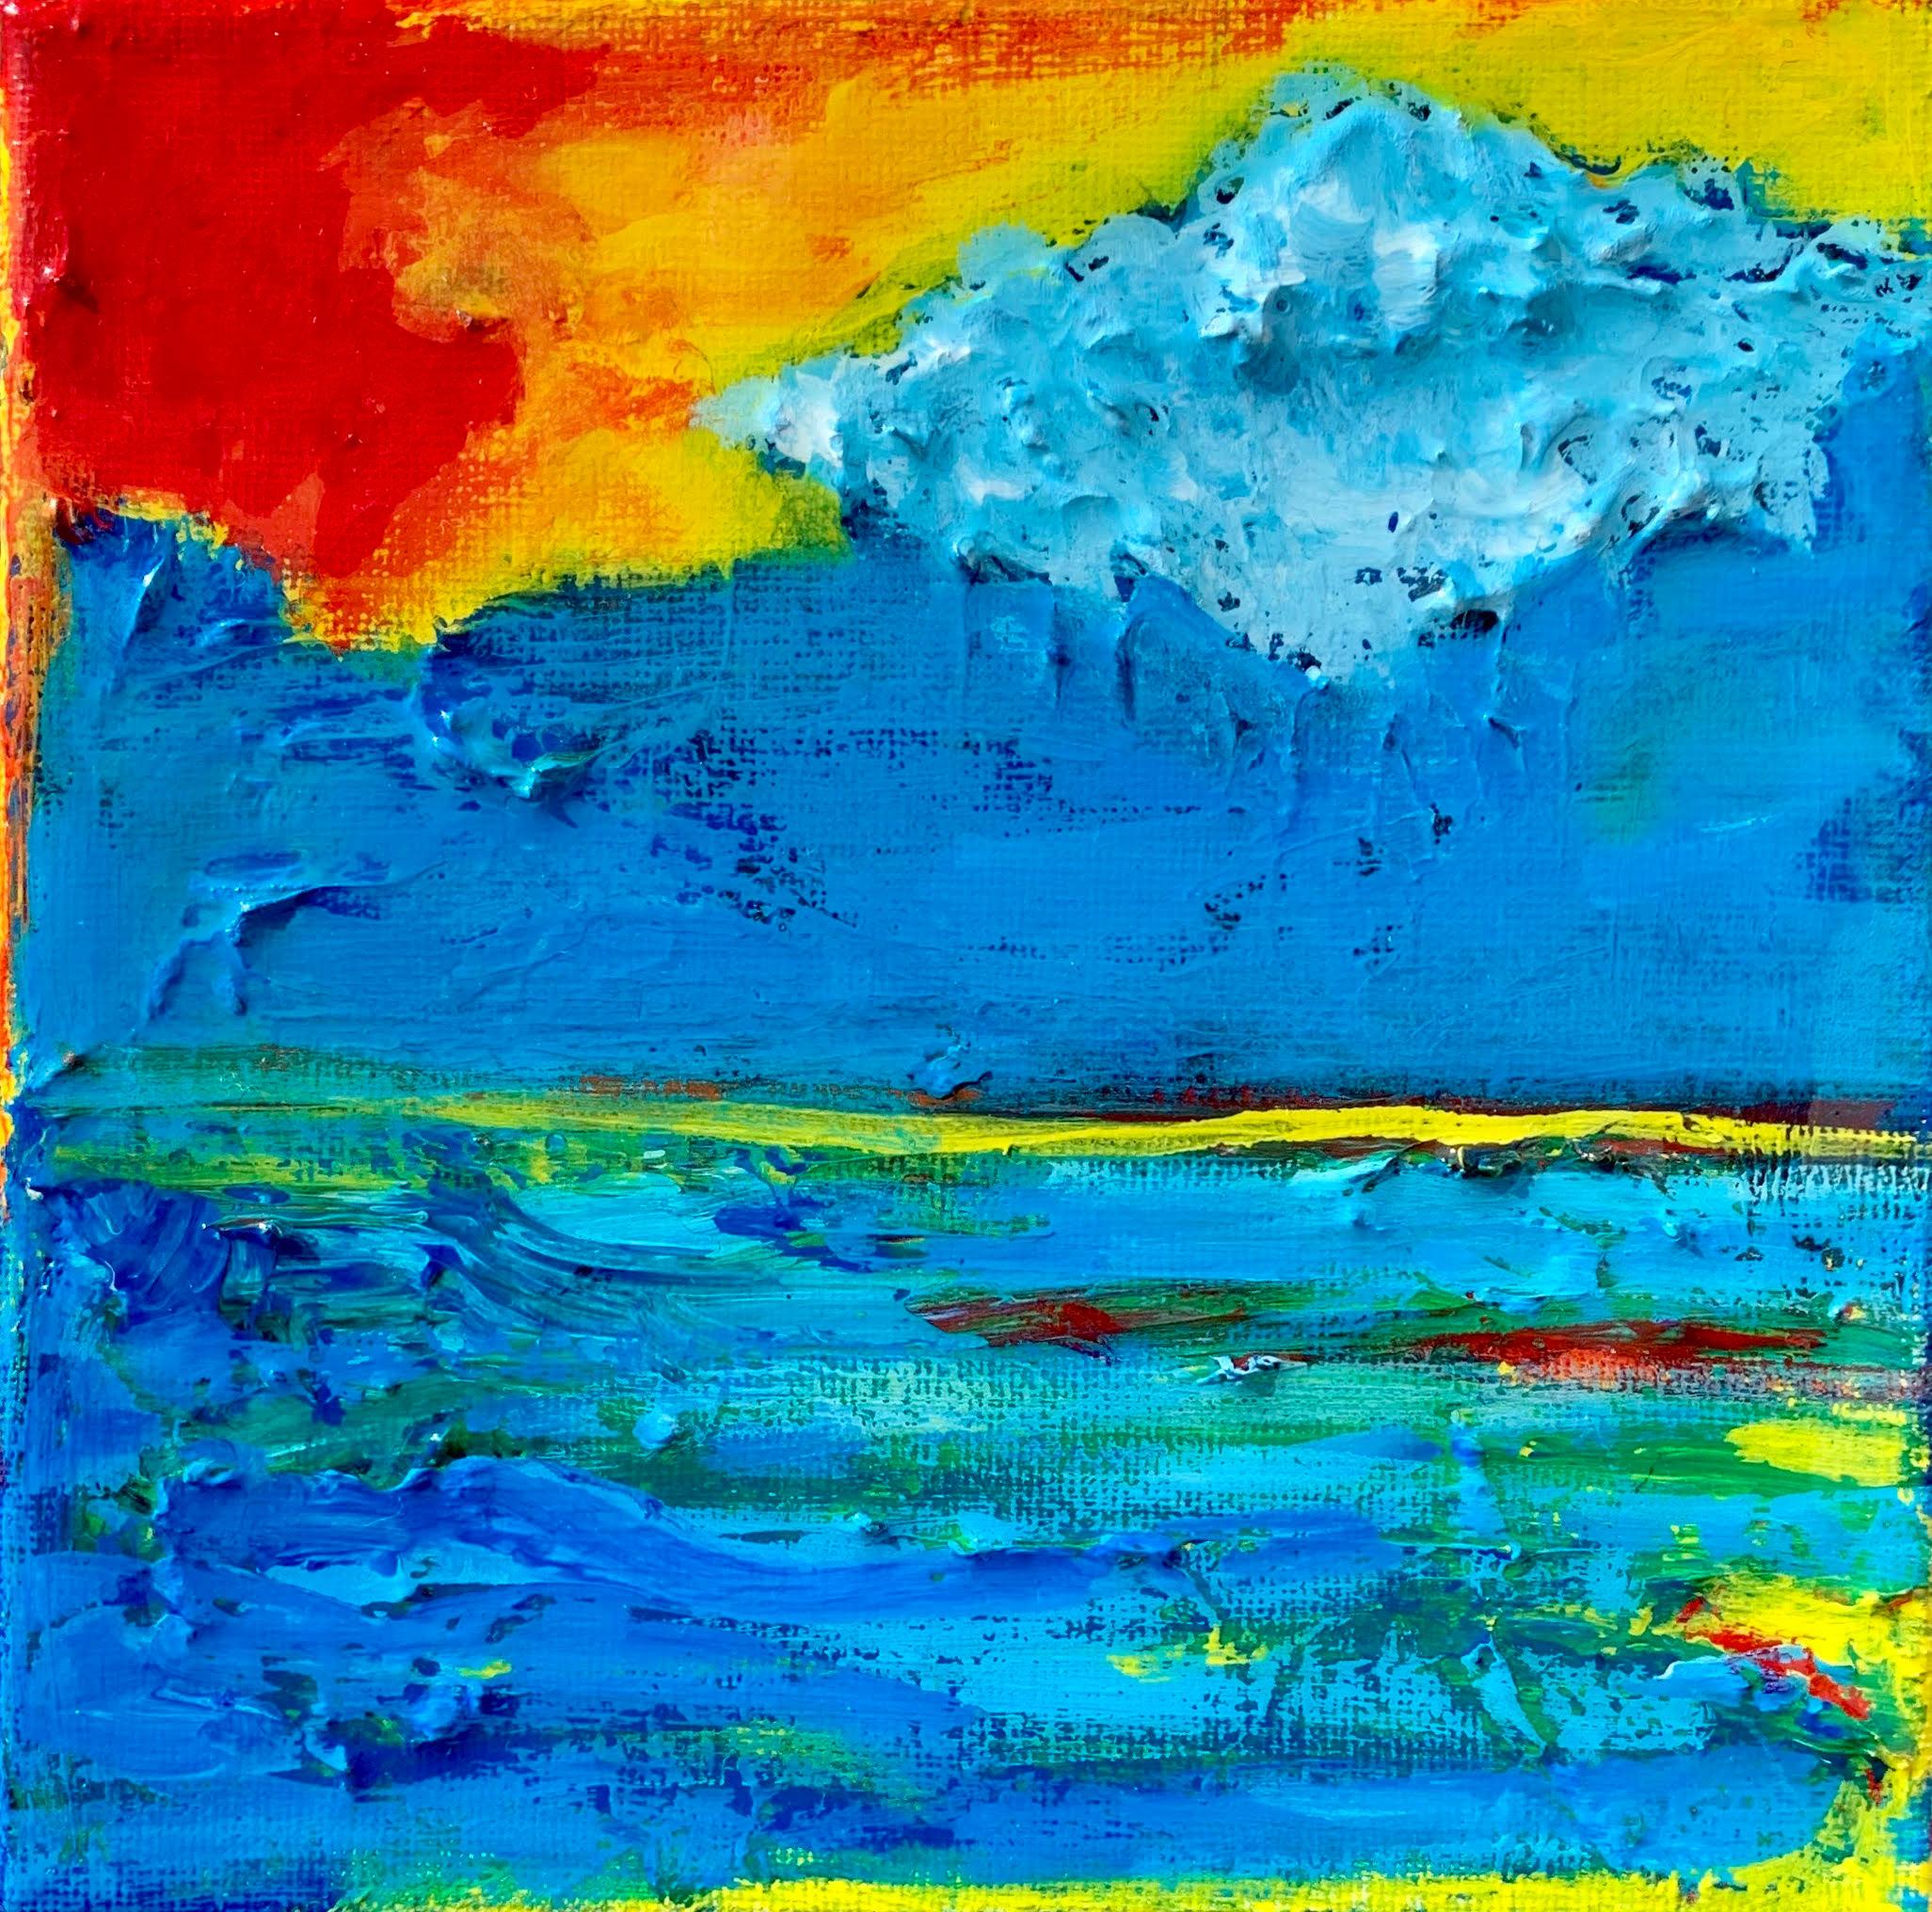 Cloud over the ocean painting artist paul zepeda kc5jmg